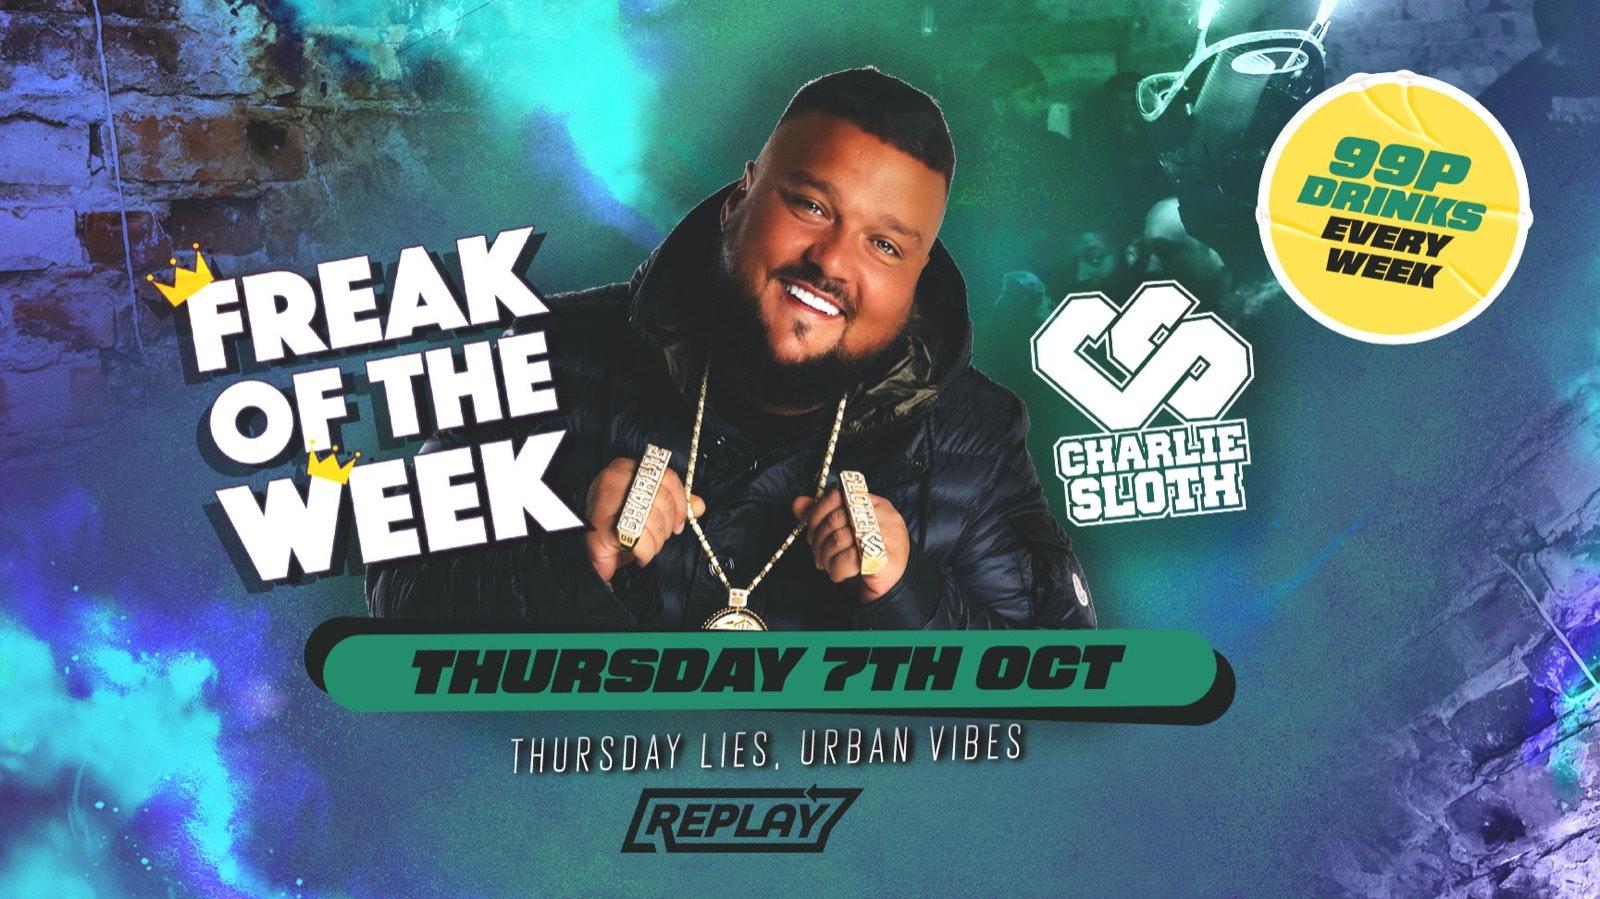 Freak Of The Week ft Charlie Sloth at Replay